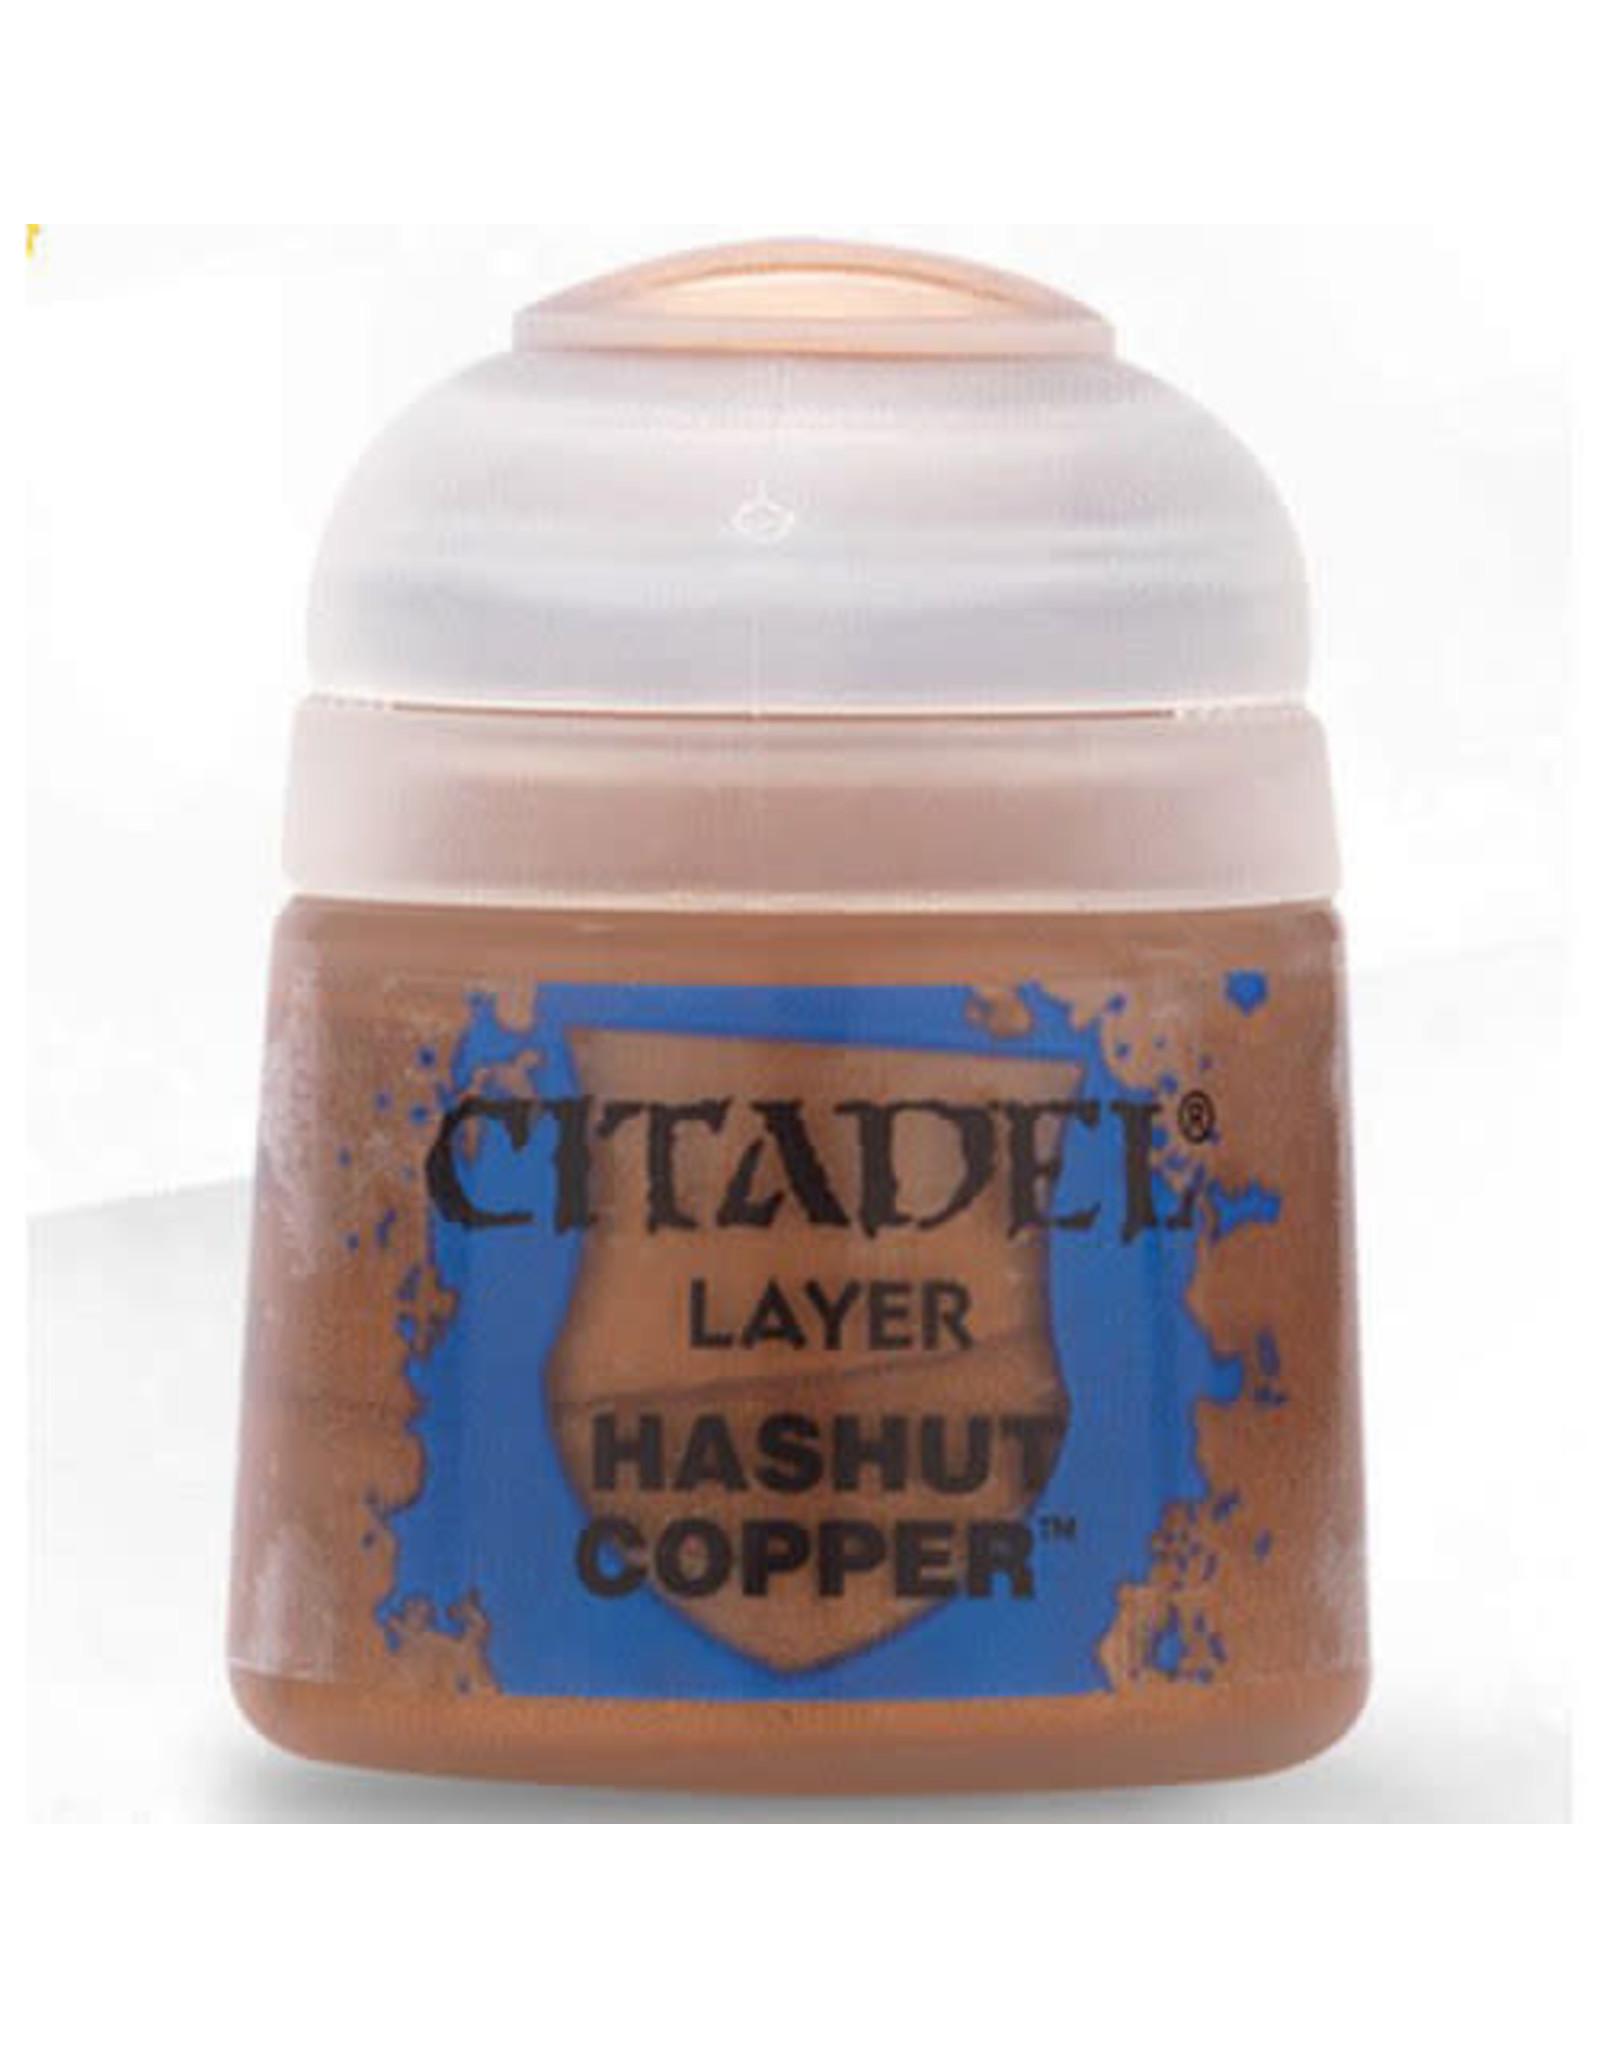 Games Workshop Citadel Paint: Hashut Copper 12ml